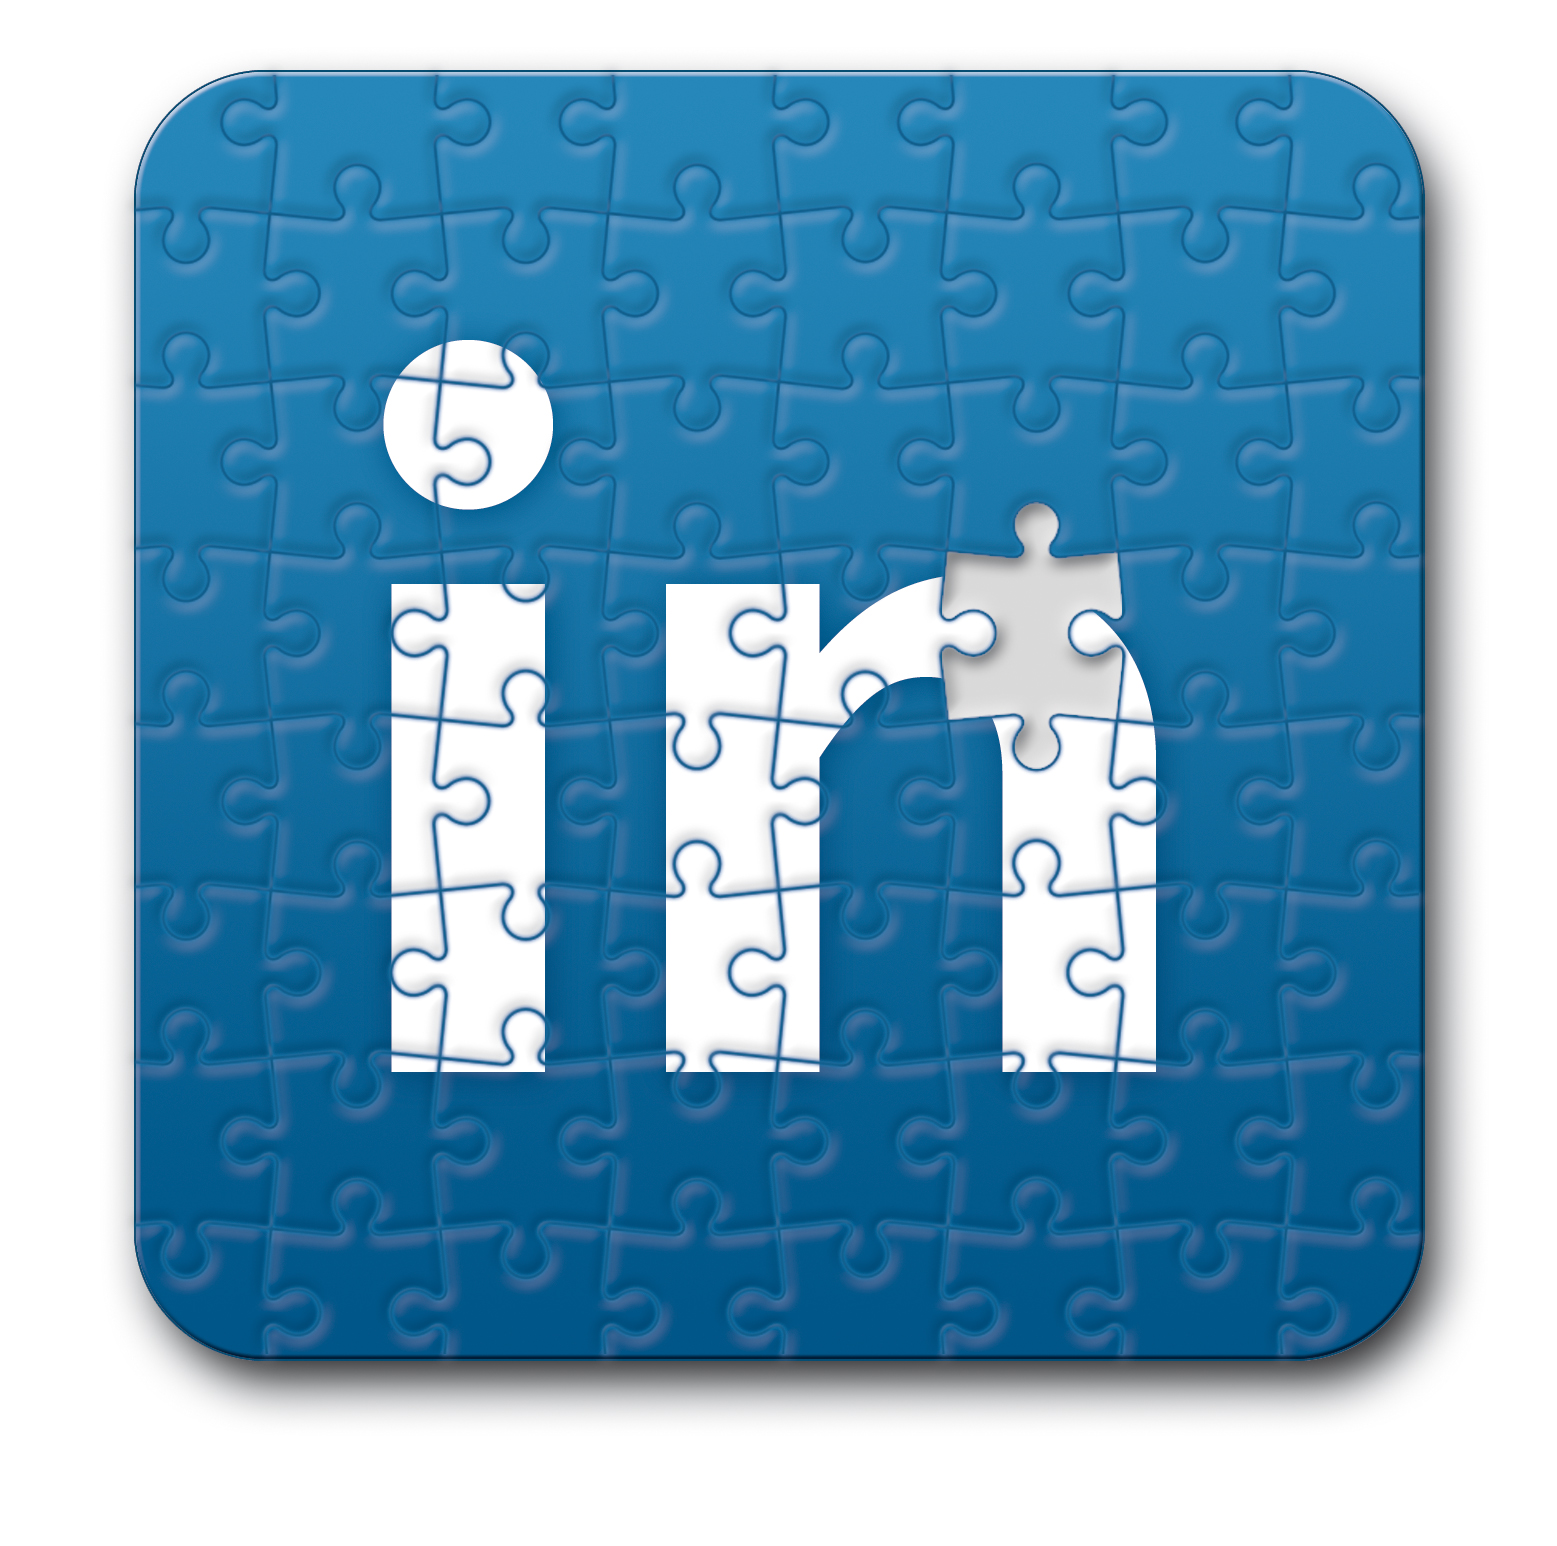 Masterclass Recruitment via LinkedIn